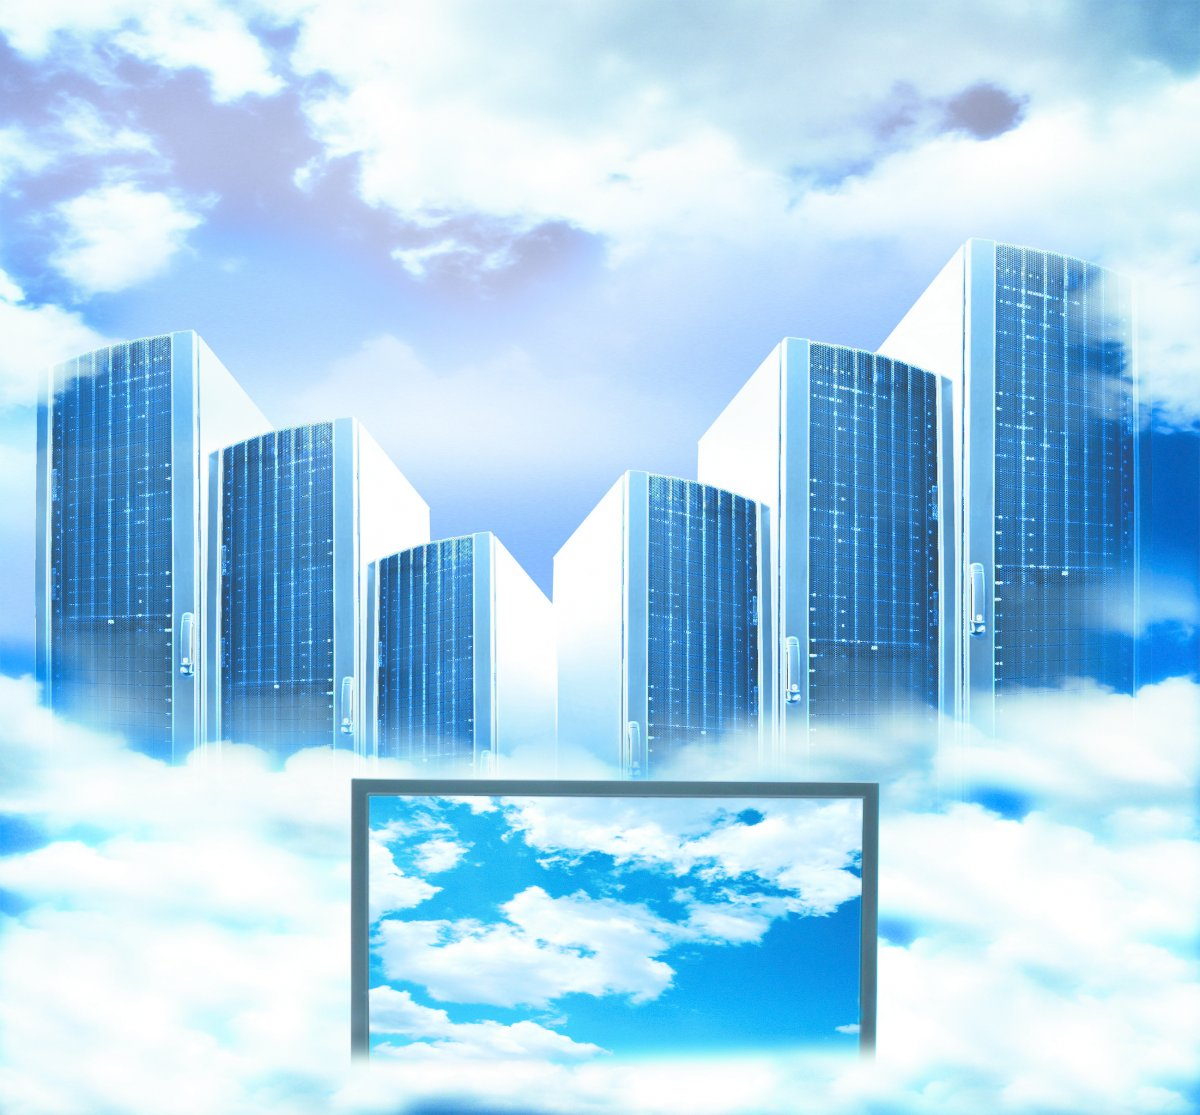 Cloud-native: CNCF raises the GitOps tool Crossplane to incubator status